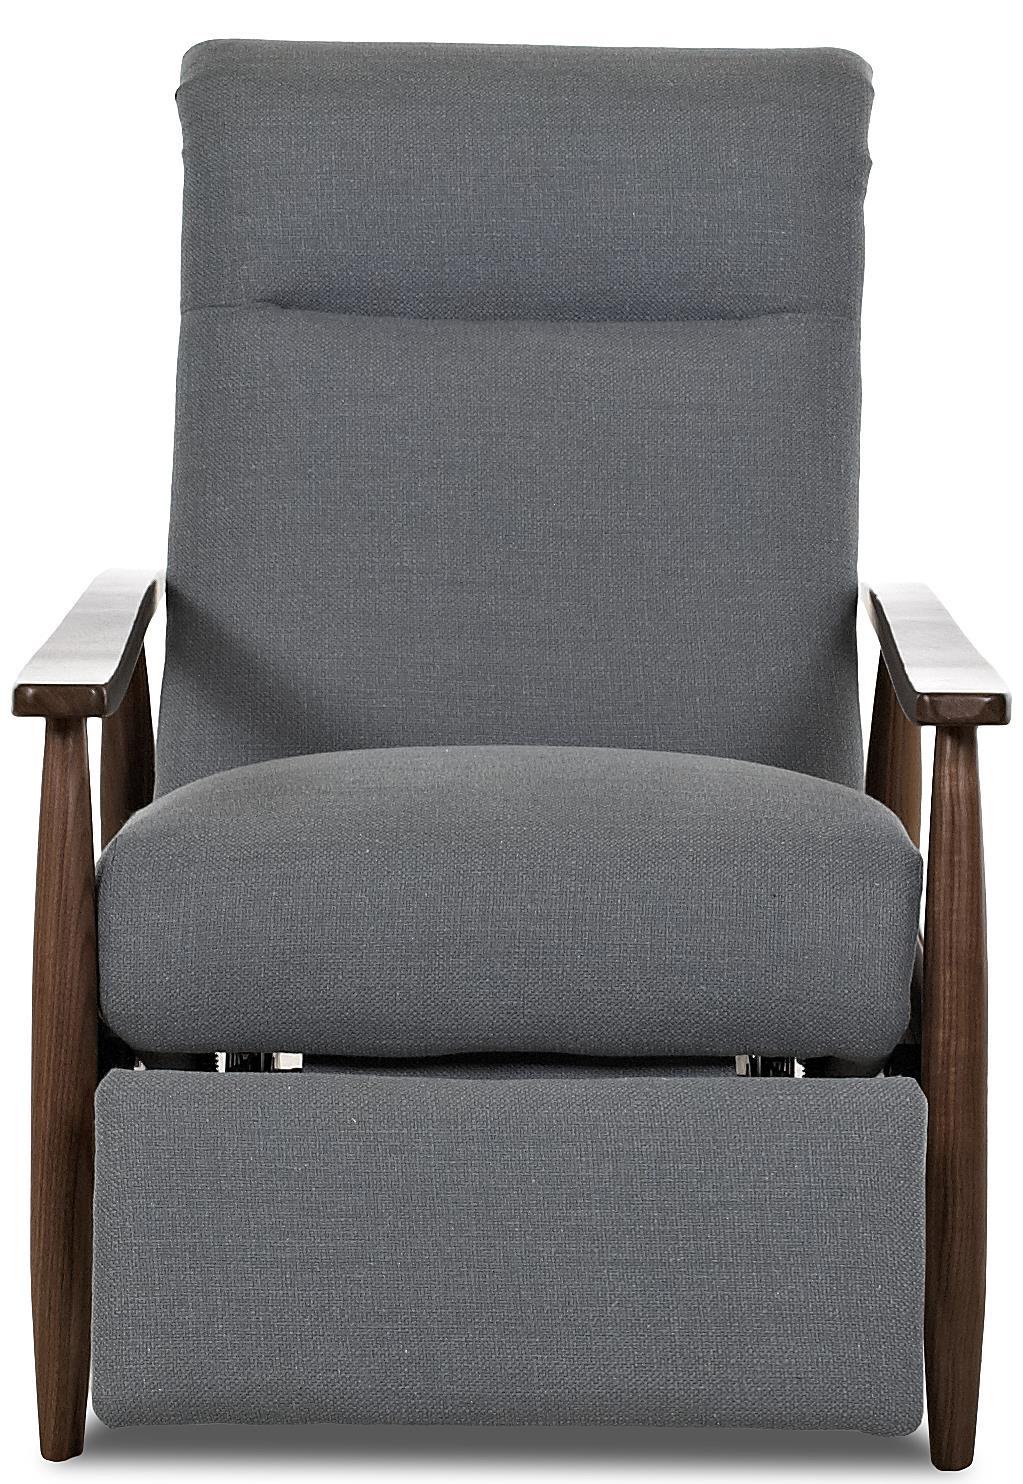 Charmant Comfort Design Designer IIHigh Leg Recliner ...